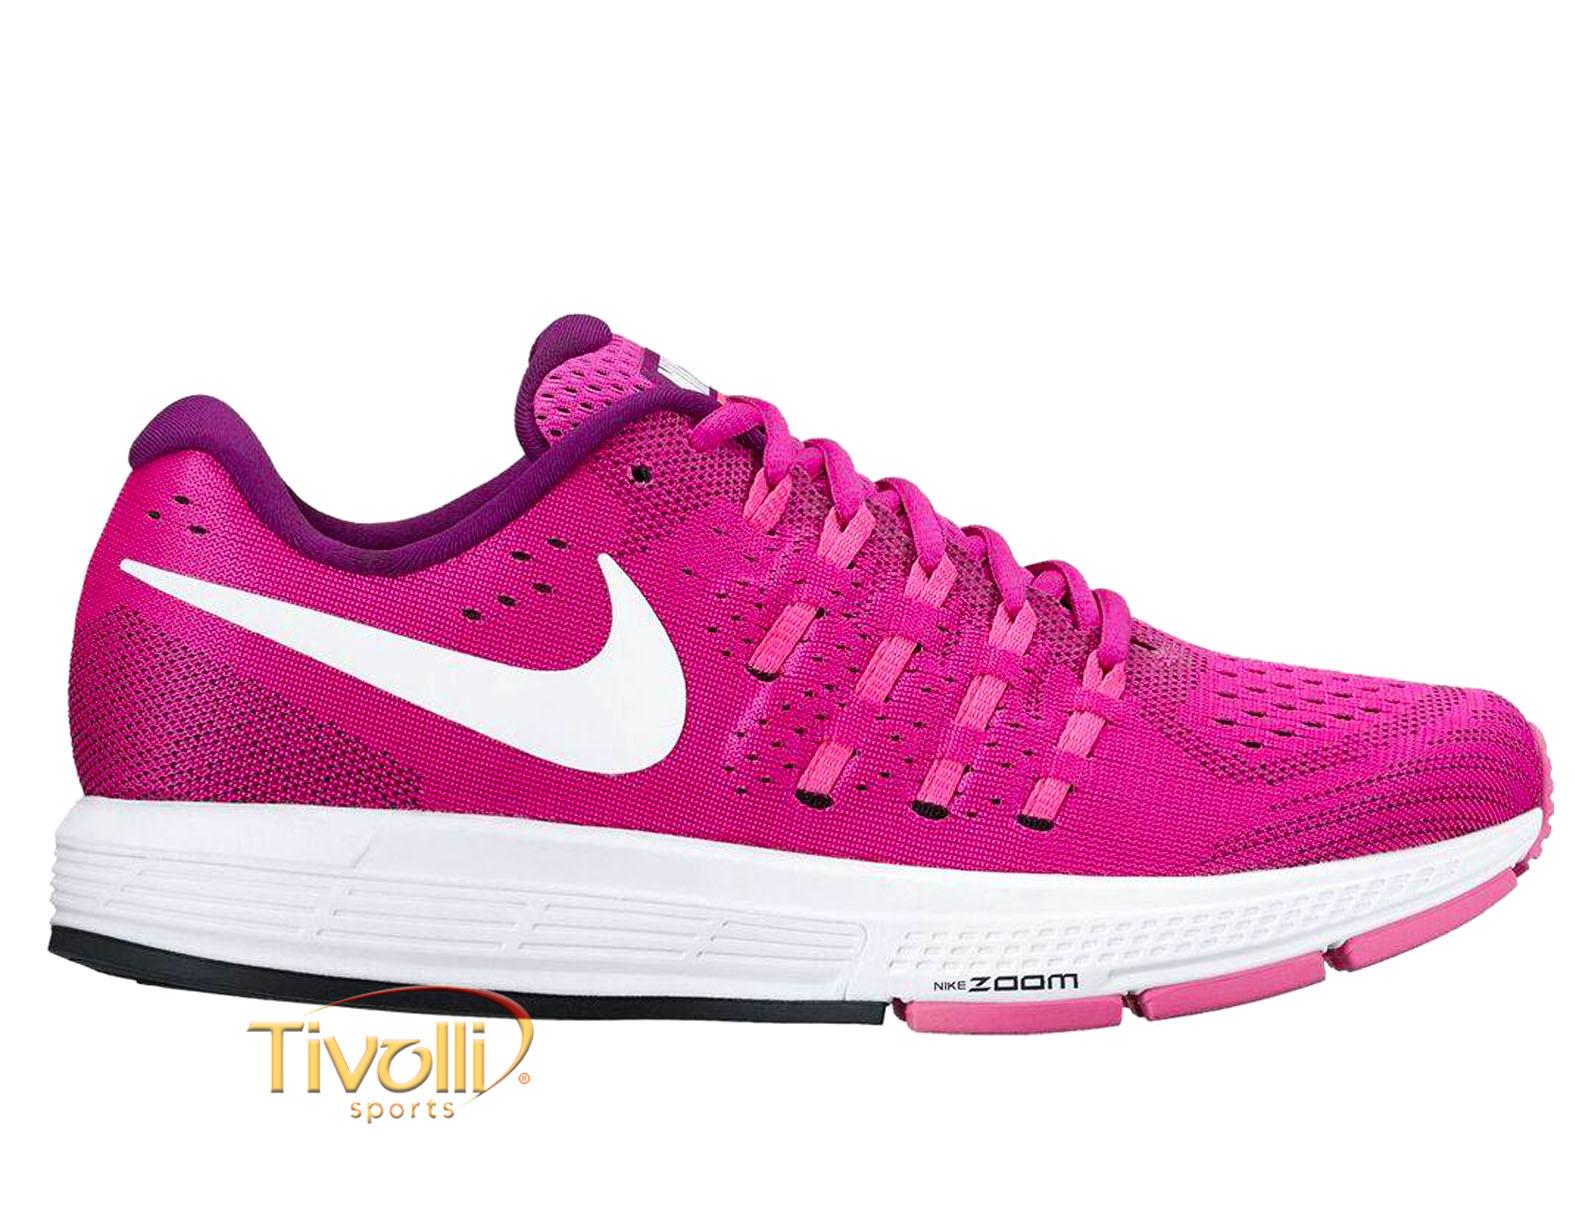 96e33b0bfcf Raquete Mania   Tênis Nike Air Zoom Vomero 11   Rosa Roxo